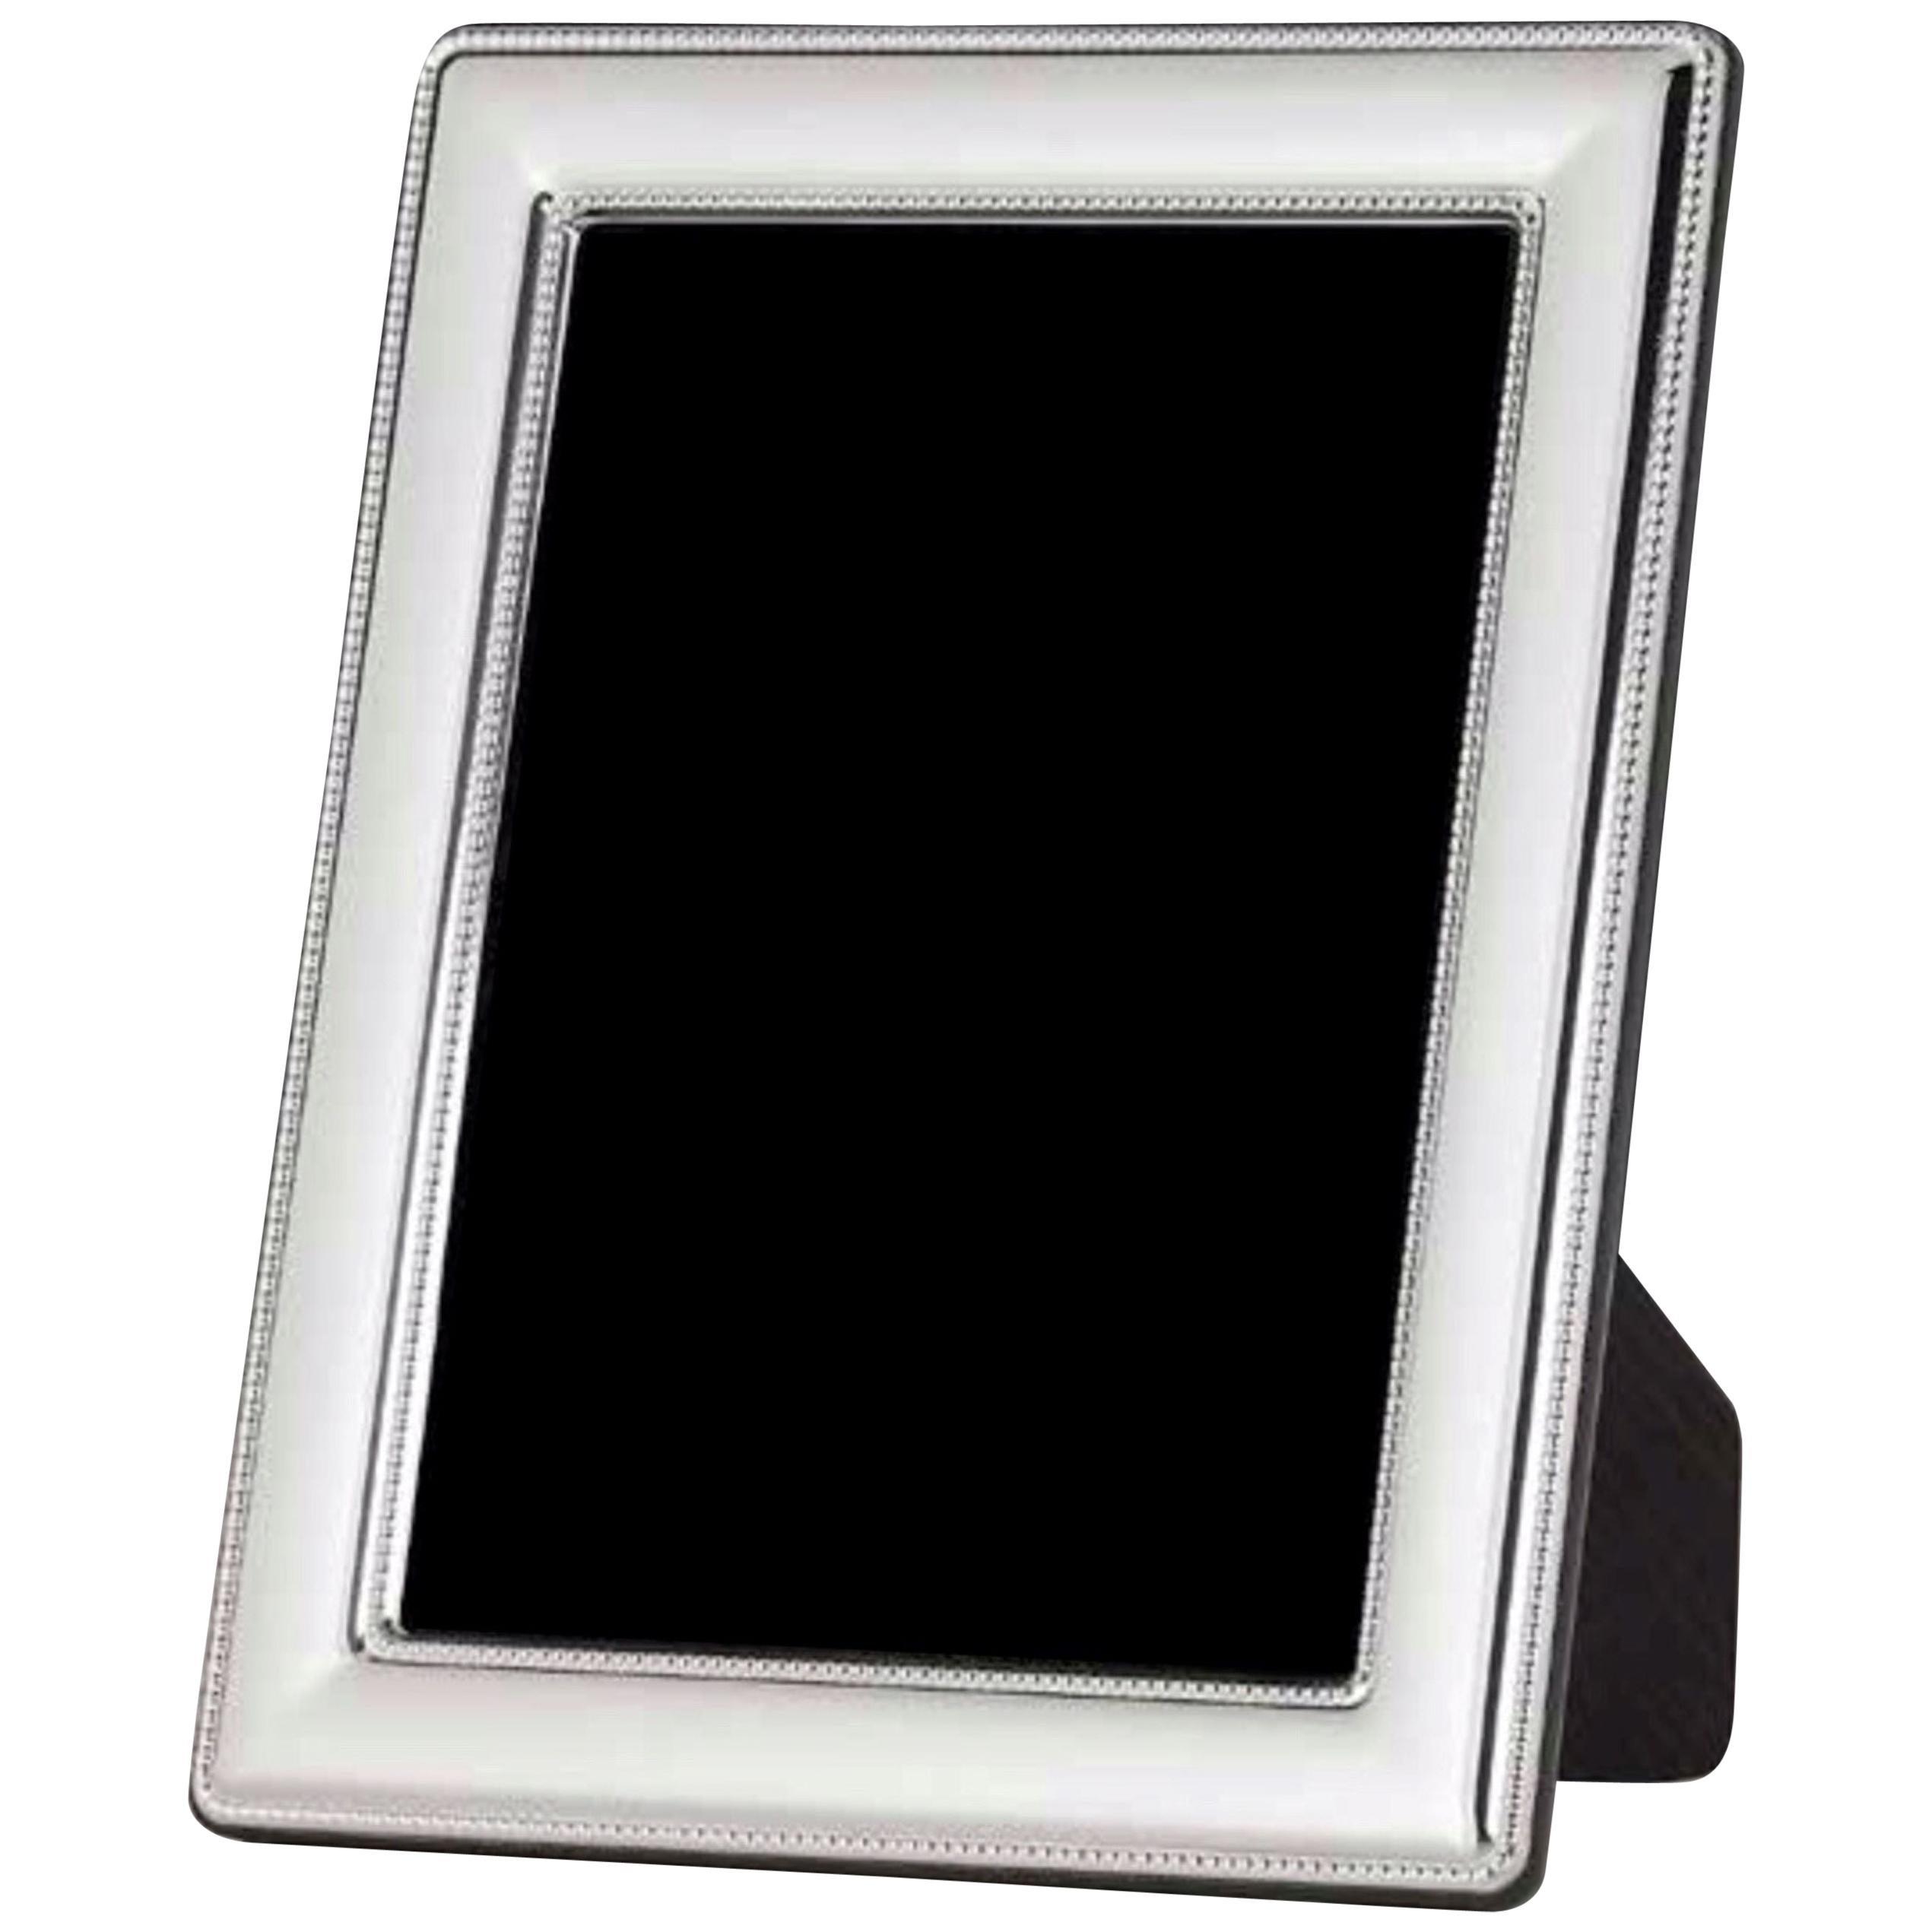 Modern Sterling Silver Frame, Italy 13 x 18 cm